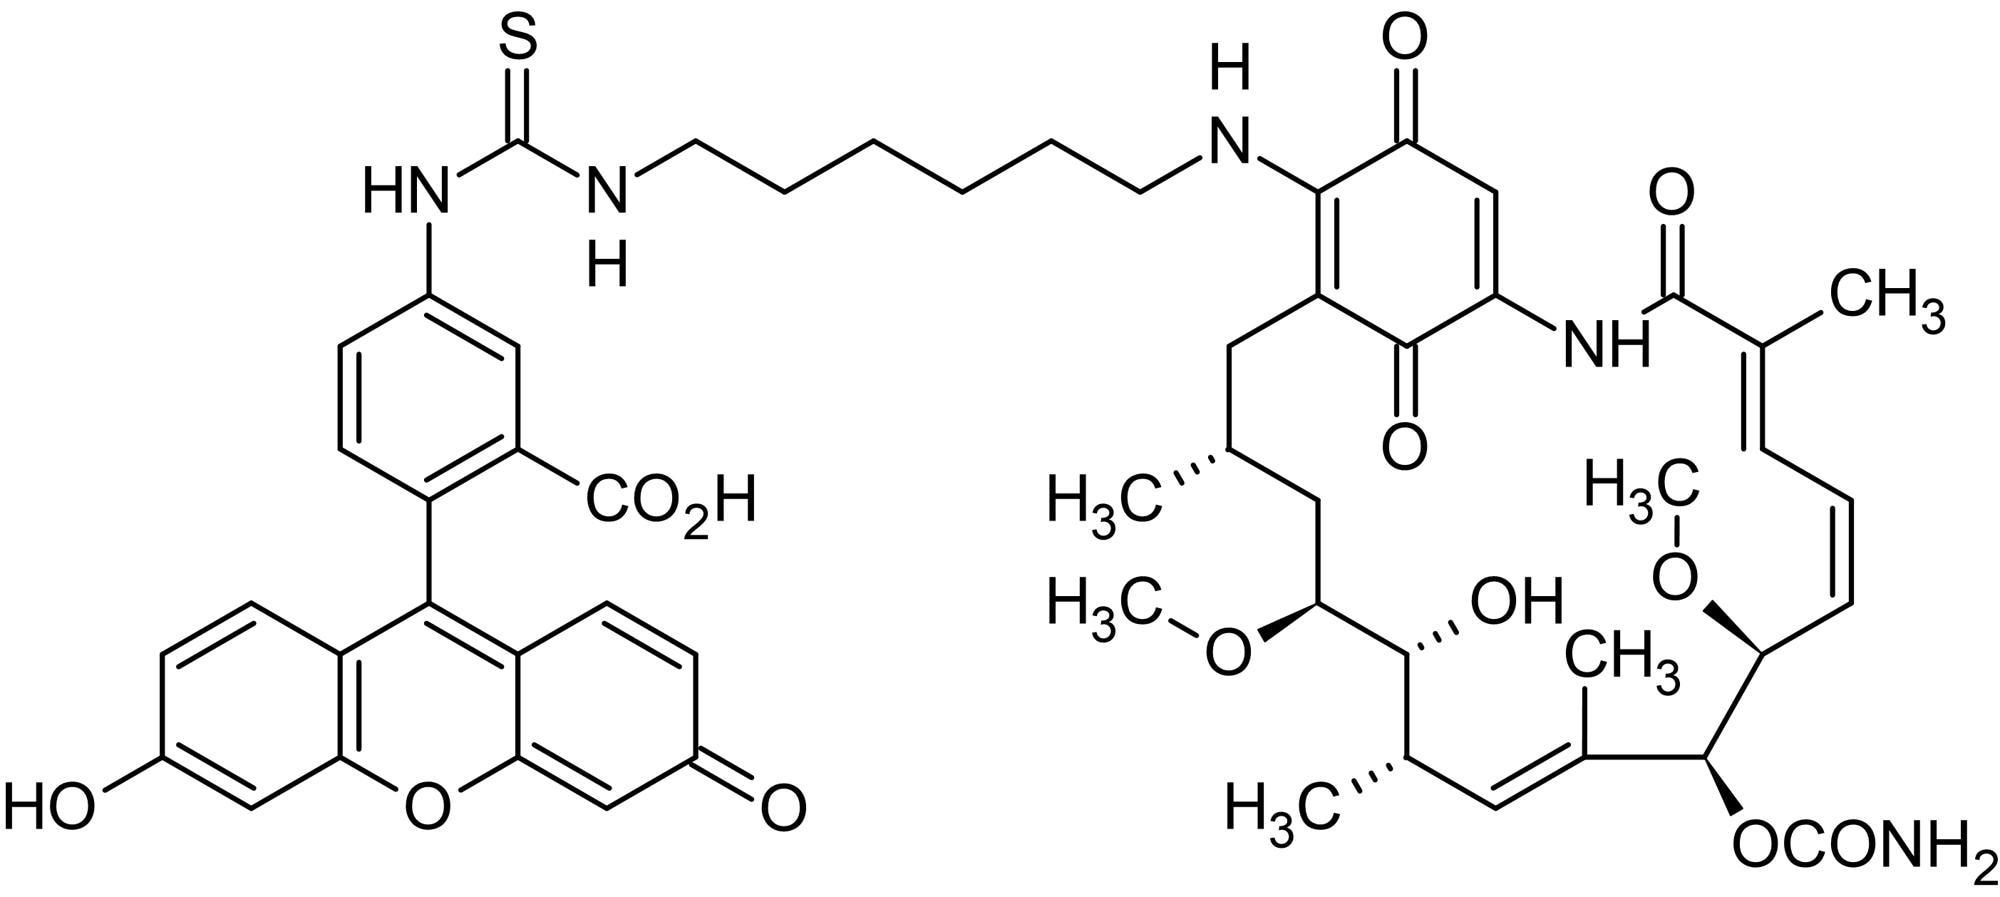 Chemical Structure - Geldanamycin-FITC, fluorescent labelled HSP90 inhibitor (ab141589)